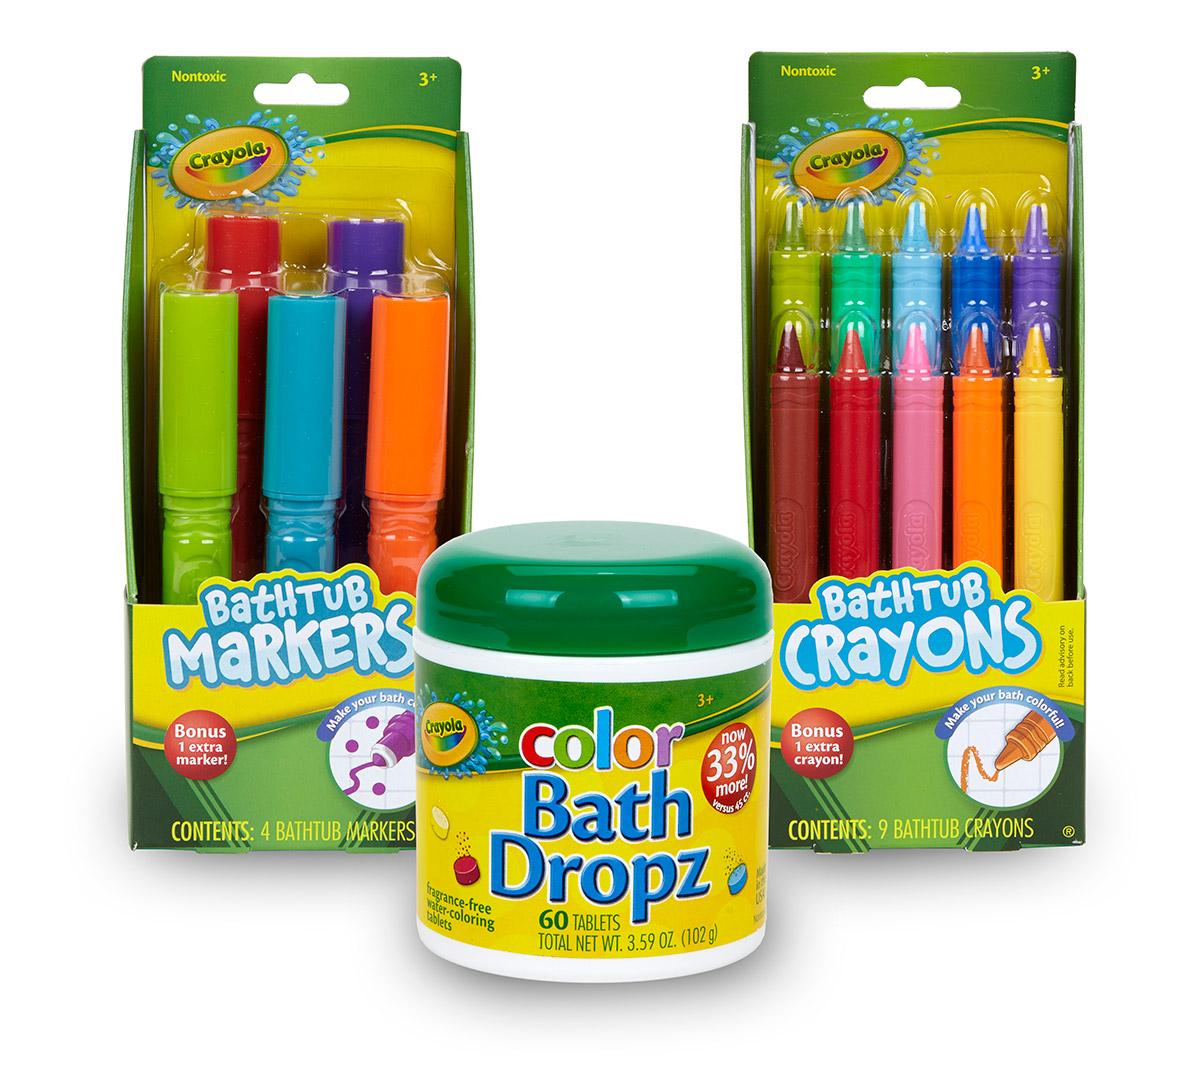 Crayola Bath Accessory Set Kids Bath Time Fun Crayola